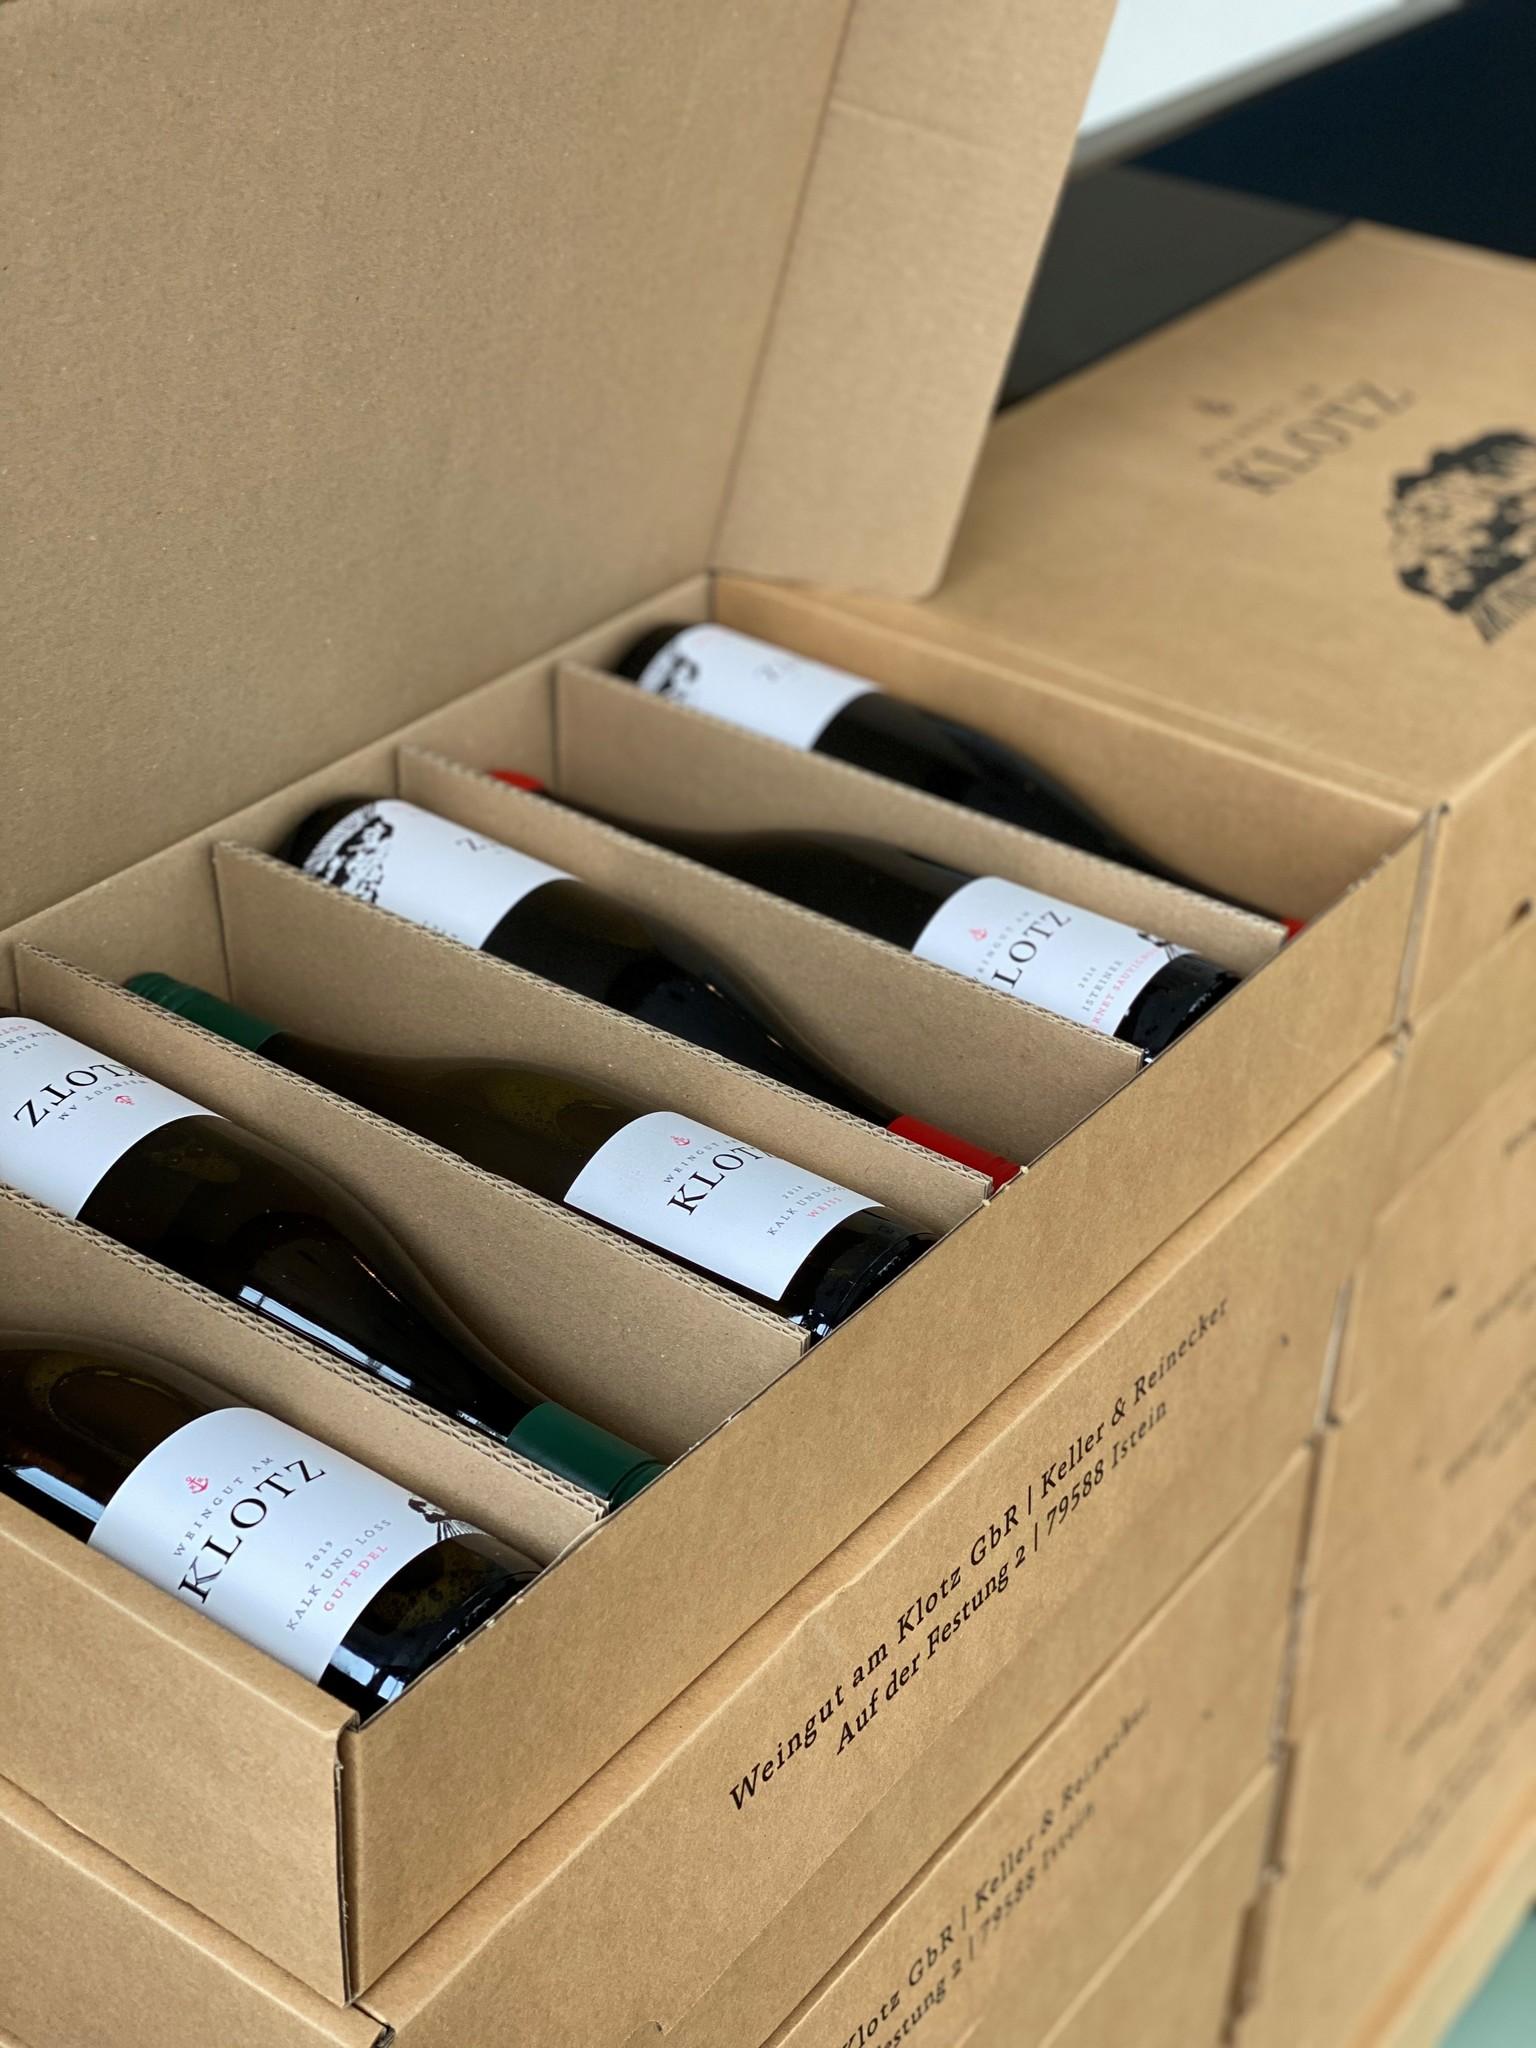 Weingut am Klotz Weinset Weingut am Klotz - 6 Flaschen